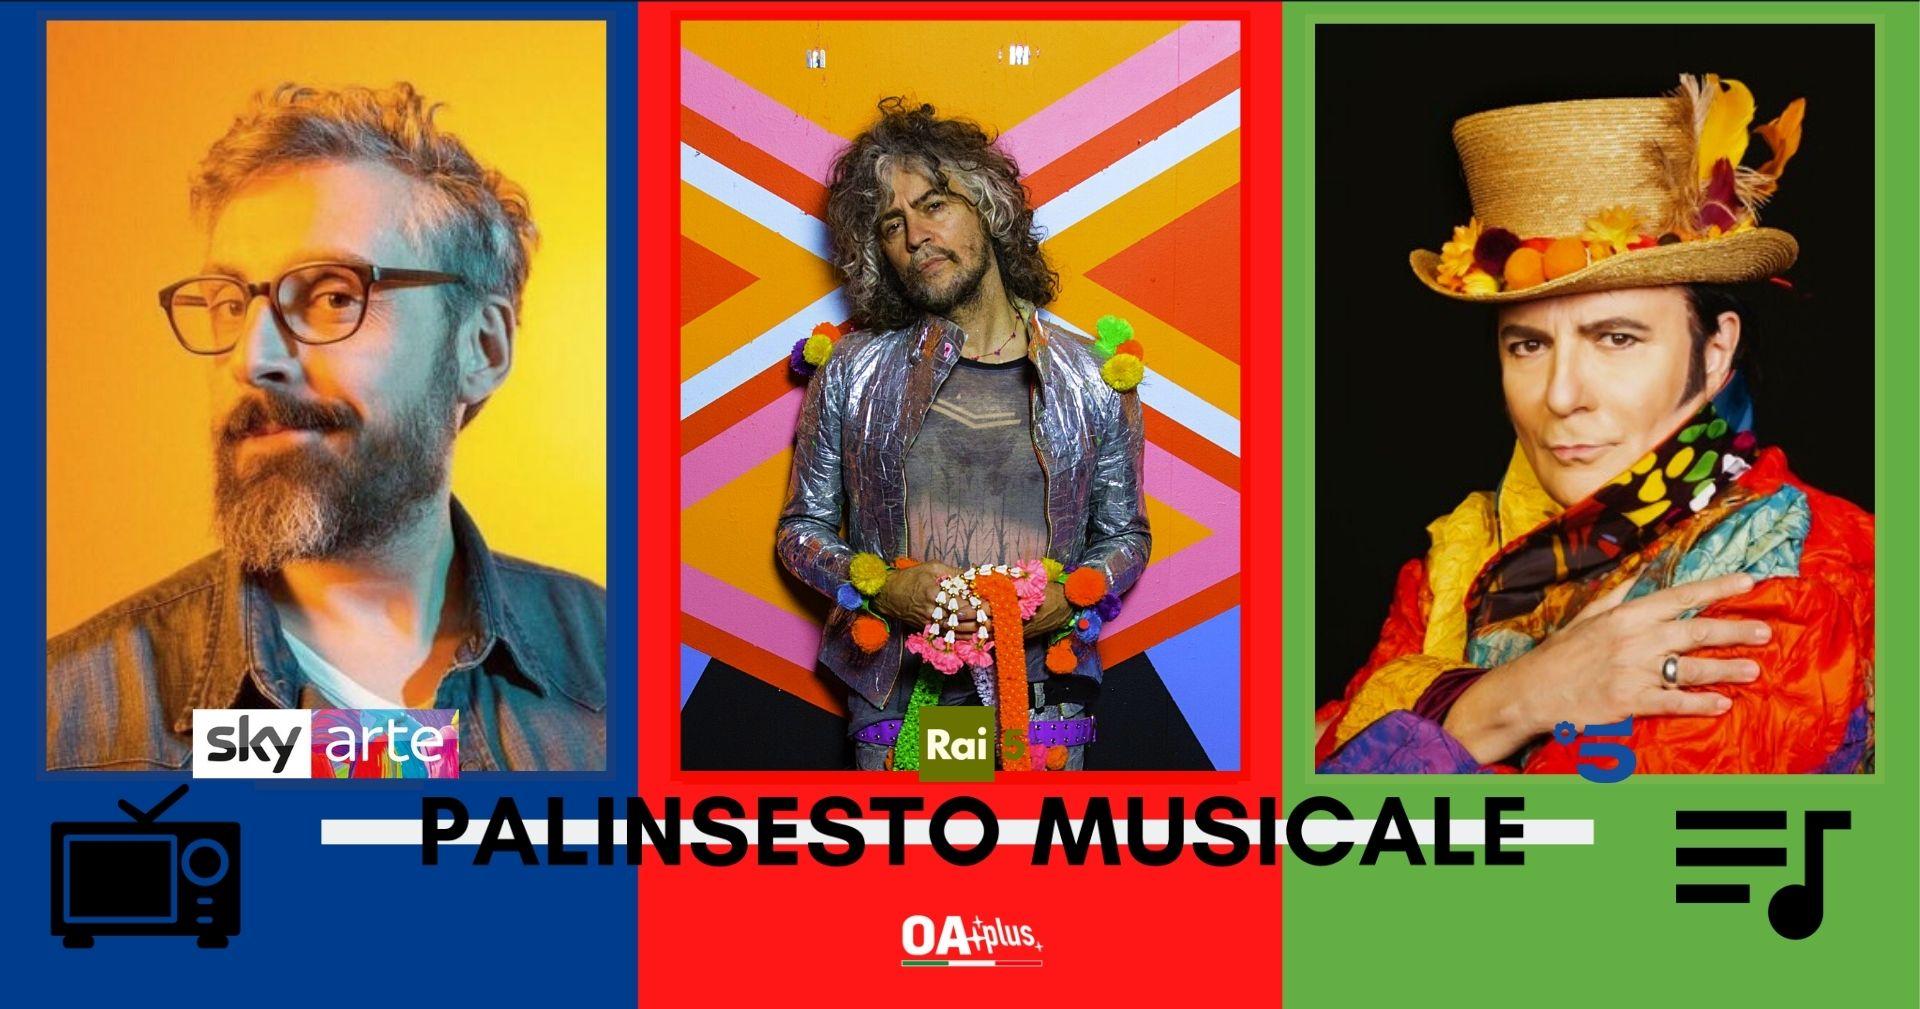 Rubrica, PALINSESTO MUSICALE: Brunori Sas, The Flaming Lips, Renato Zero